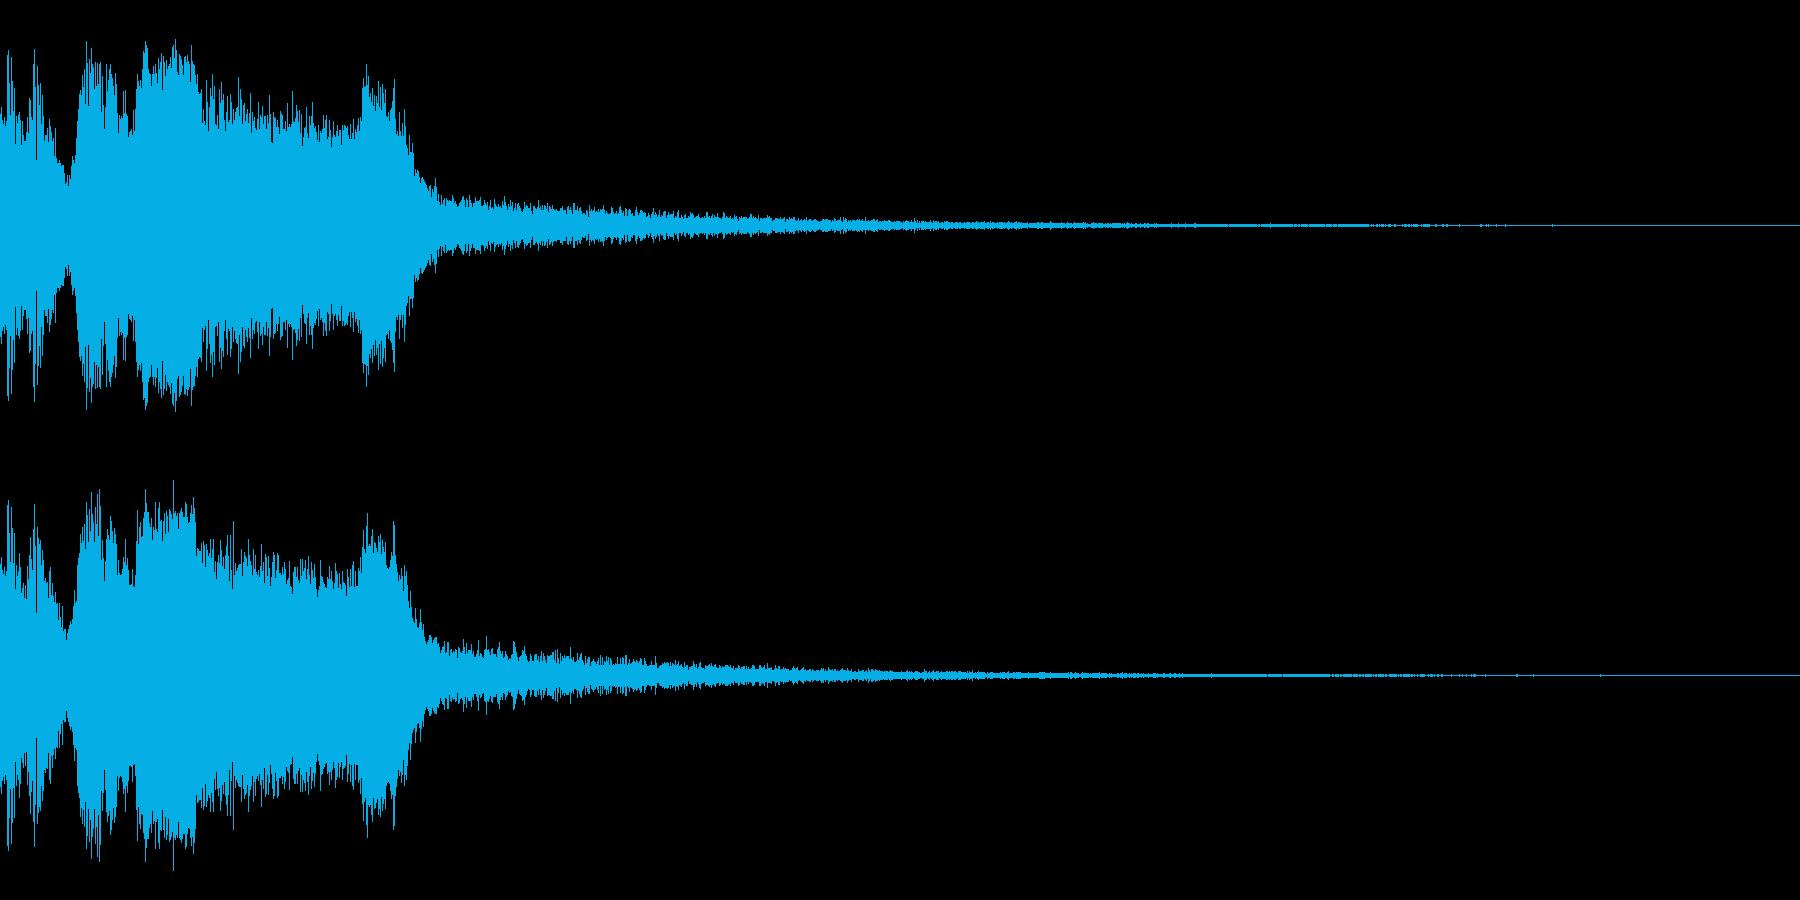 DJFX ヒットチャート発表前SE 14の再生済みの波形